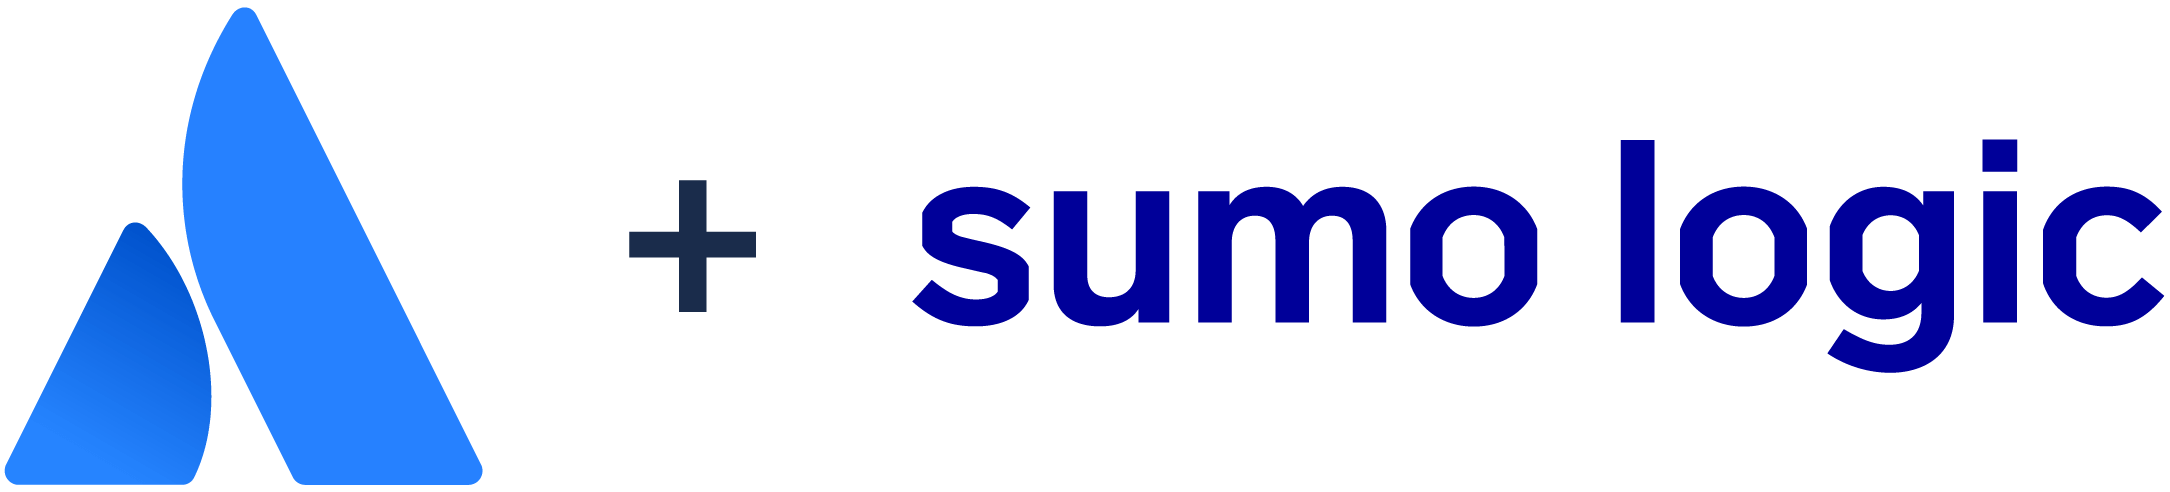 Atlassian logo + Sumo Logic logo